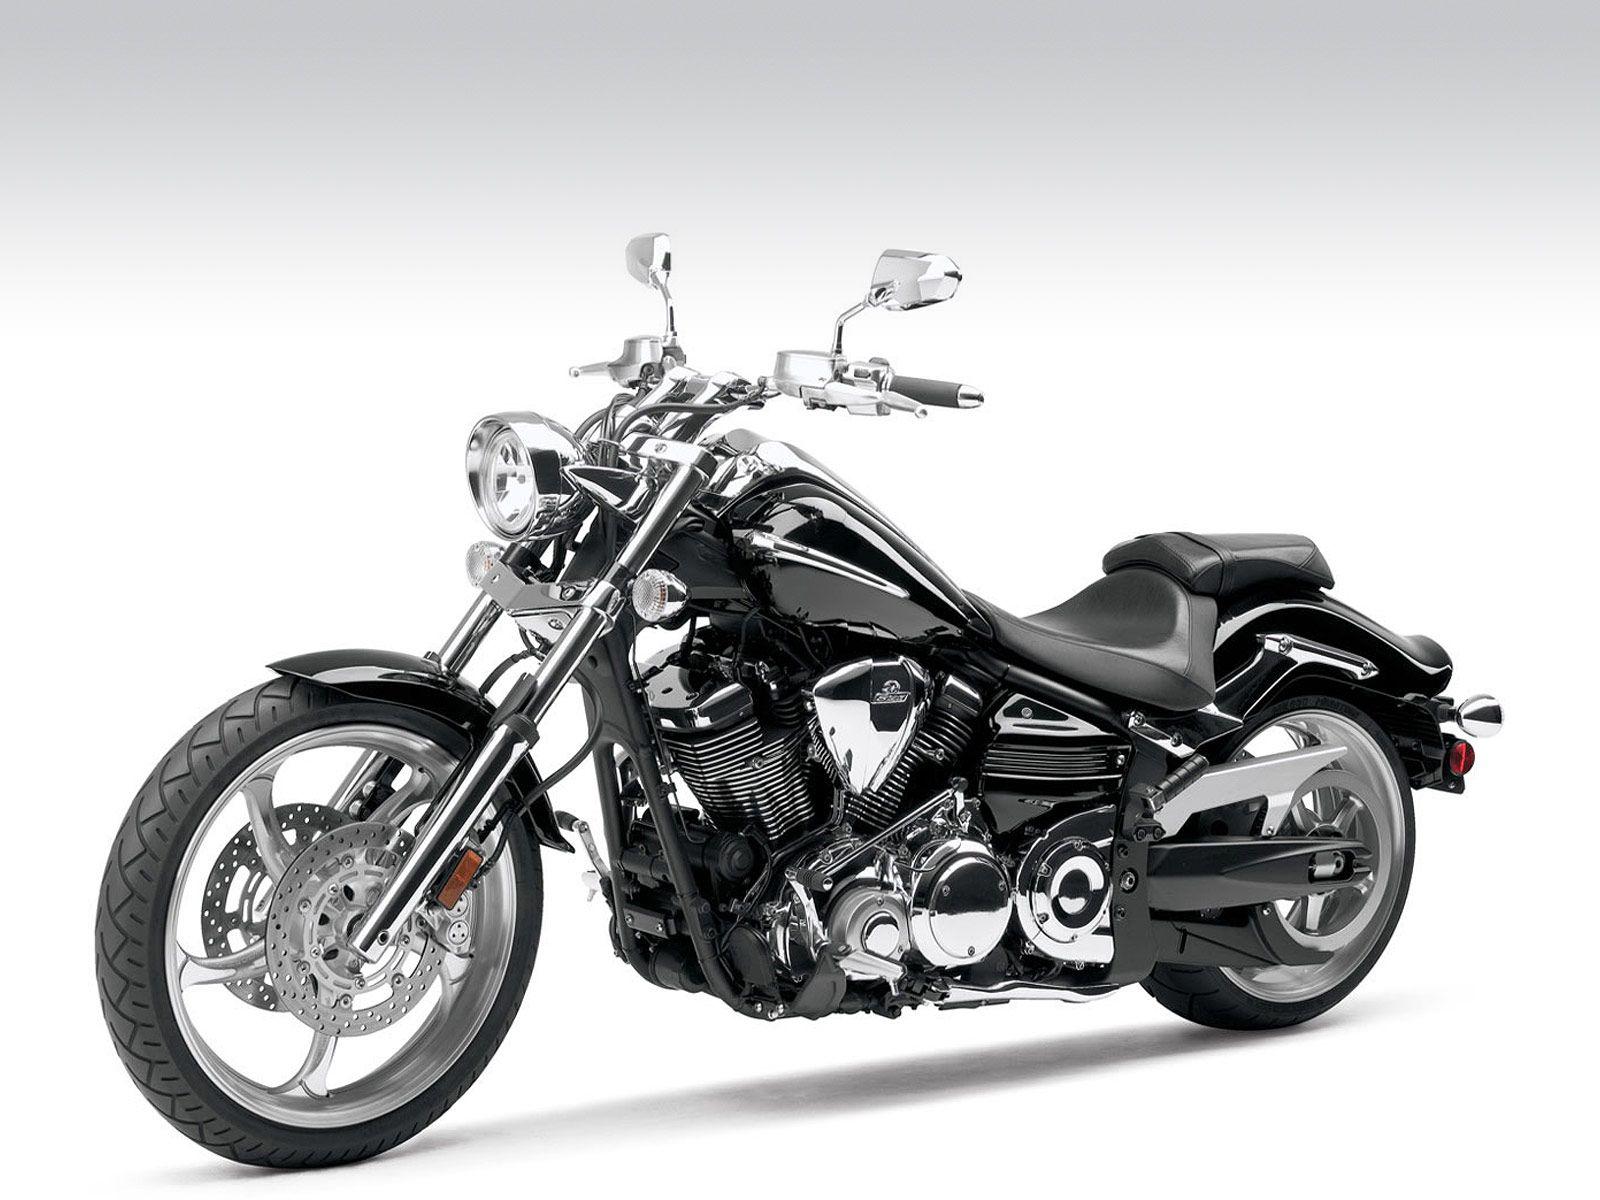 Motorcycle case 2010 cruiser motorcycles yamaha raider s xv1900s